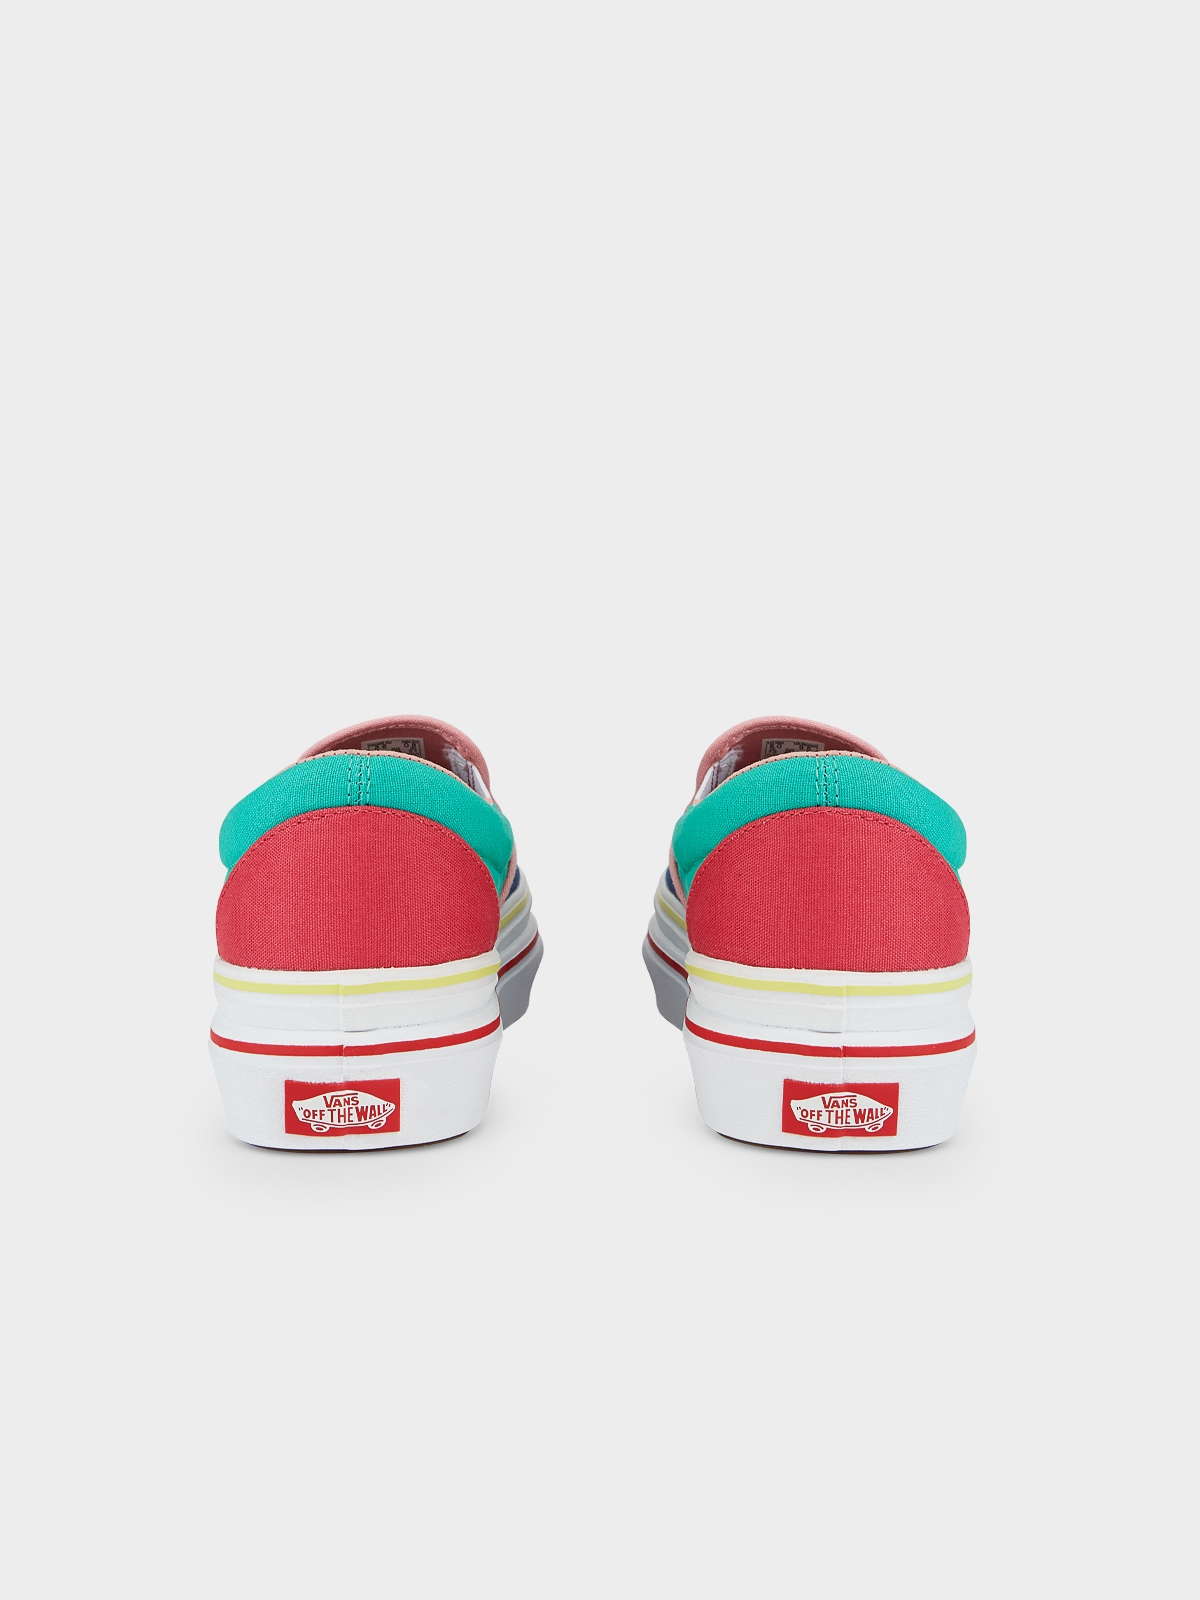 Vans Super ComfyCush Slip On Sneakers Multi Color